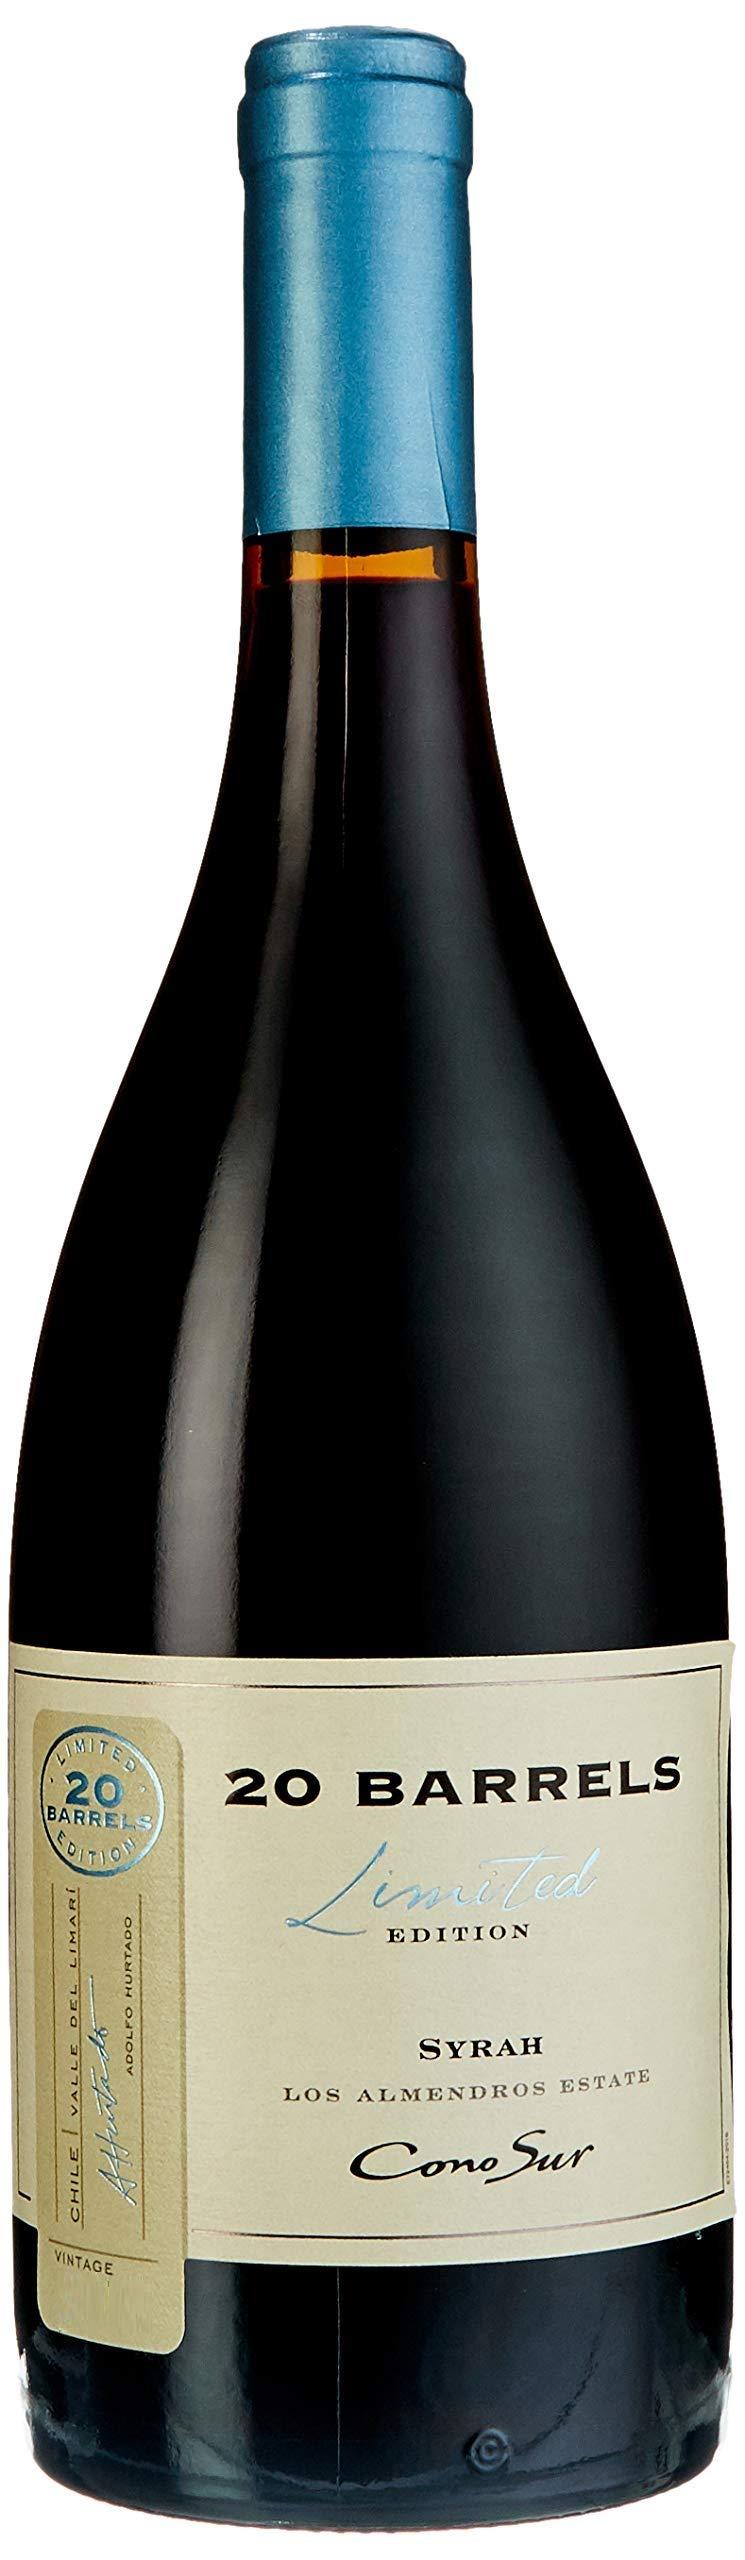 Cono-Sur-20-Barrels-Syrah-Limar-Valley-1er-Pack-1-x-750-ml